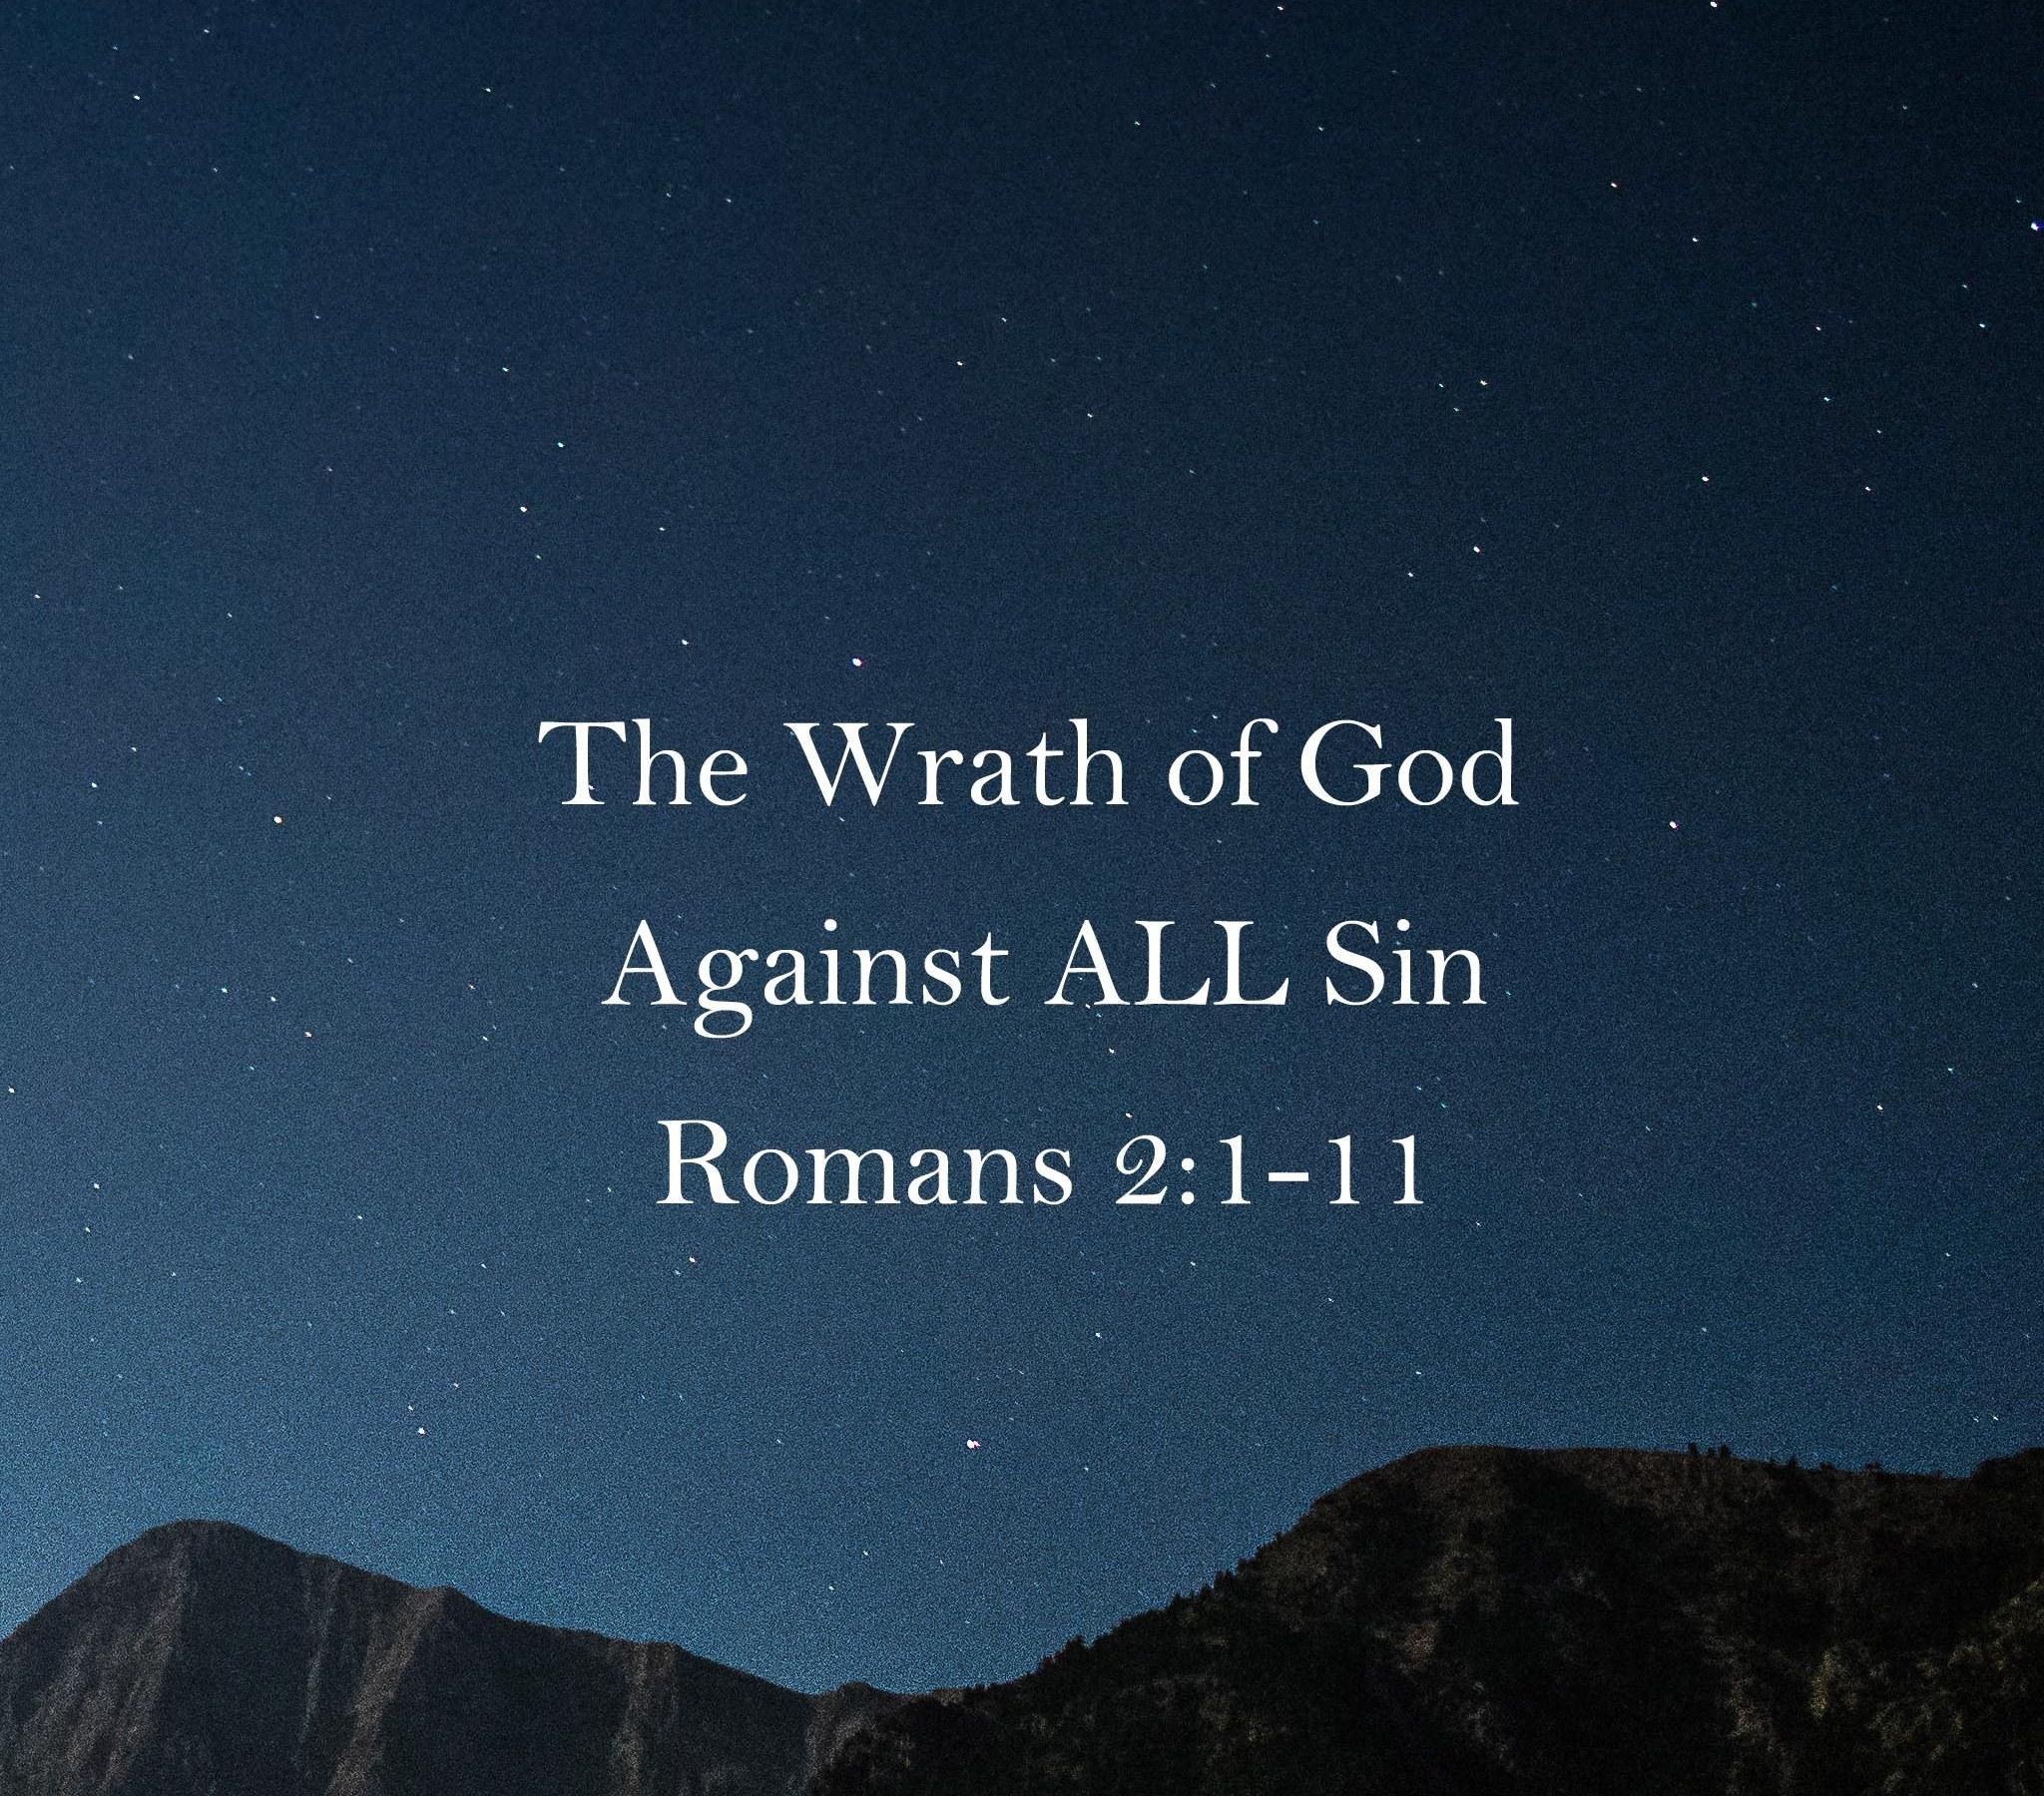 Sermon: The Wrath of God Against ALL Sin Romans 2:1-11